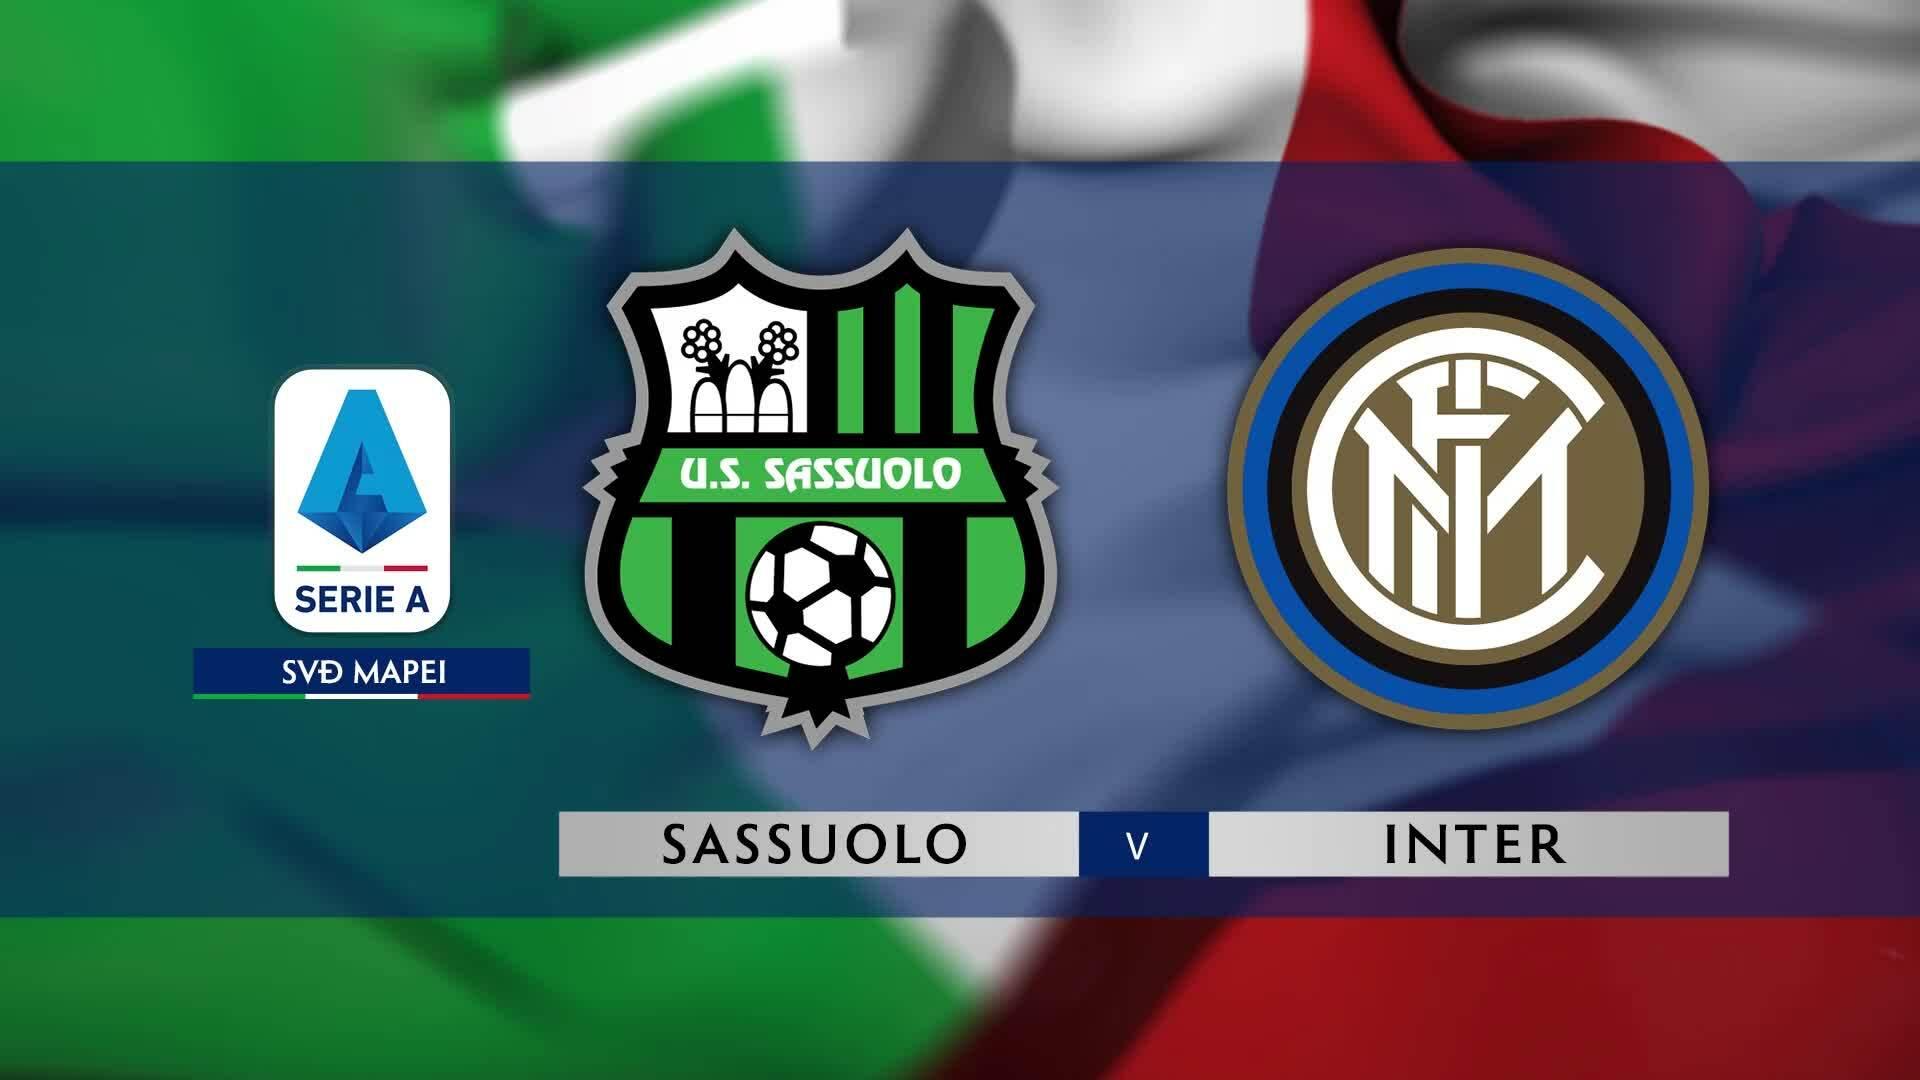 Sassuolo 3-4 Inter Milan